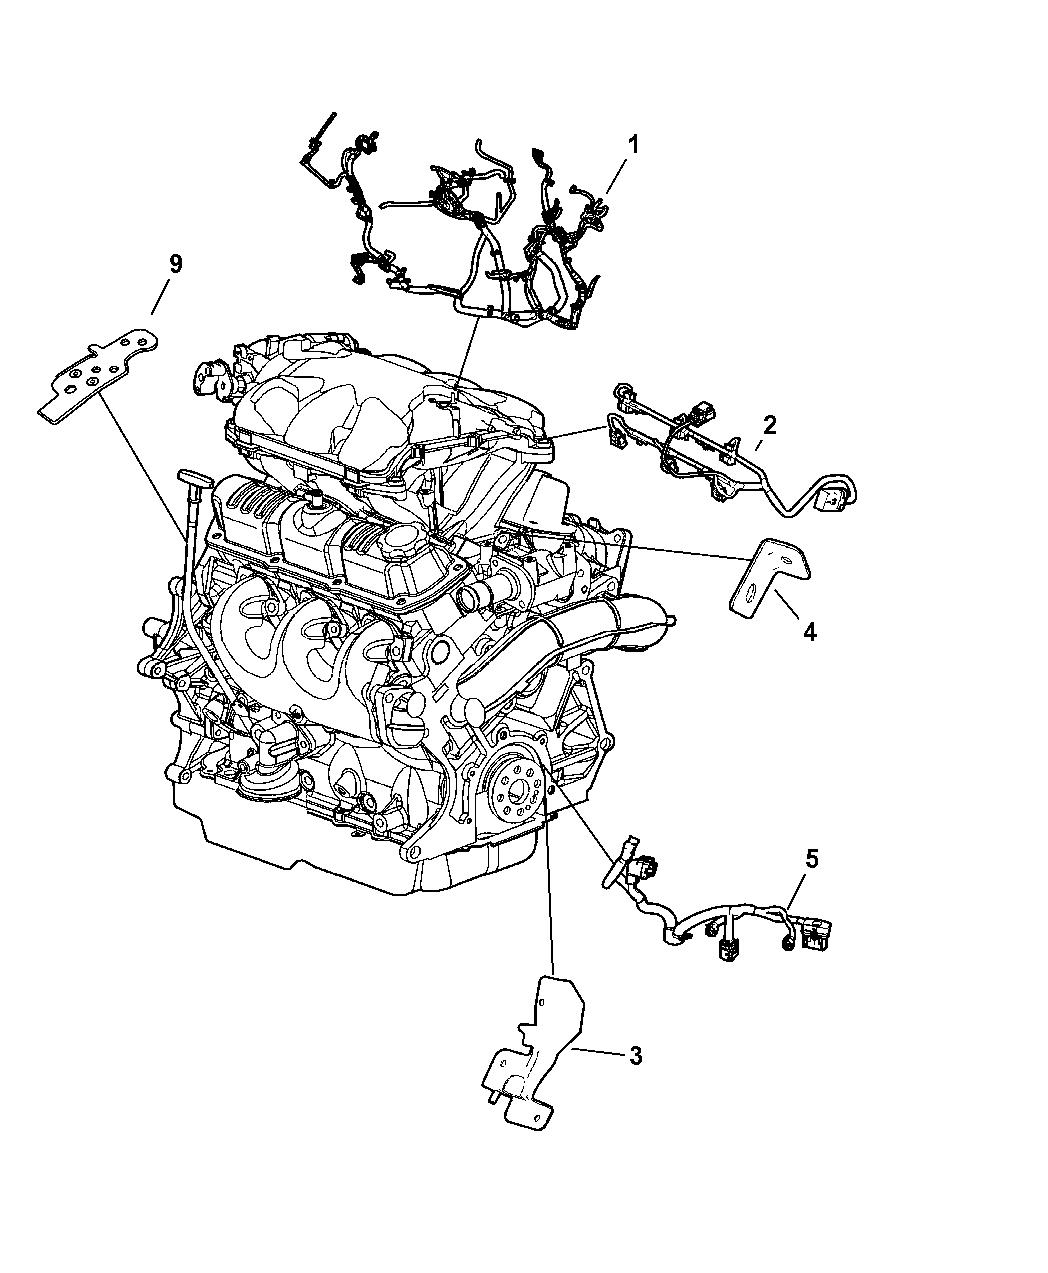 dodge caravan 2 4l engine diagram 2006 caravan 2 4 engine diagram